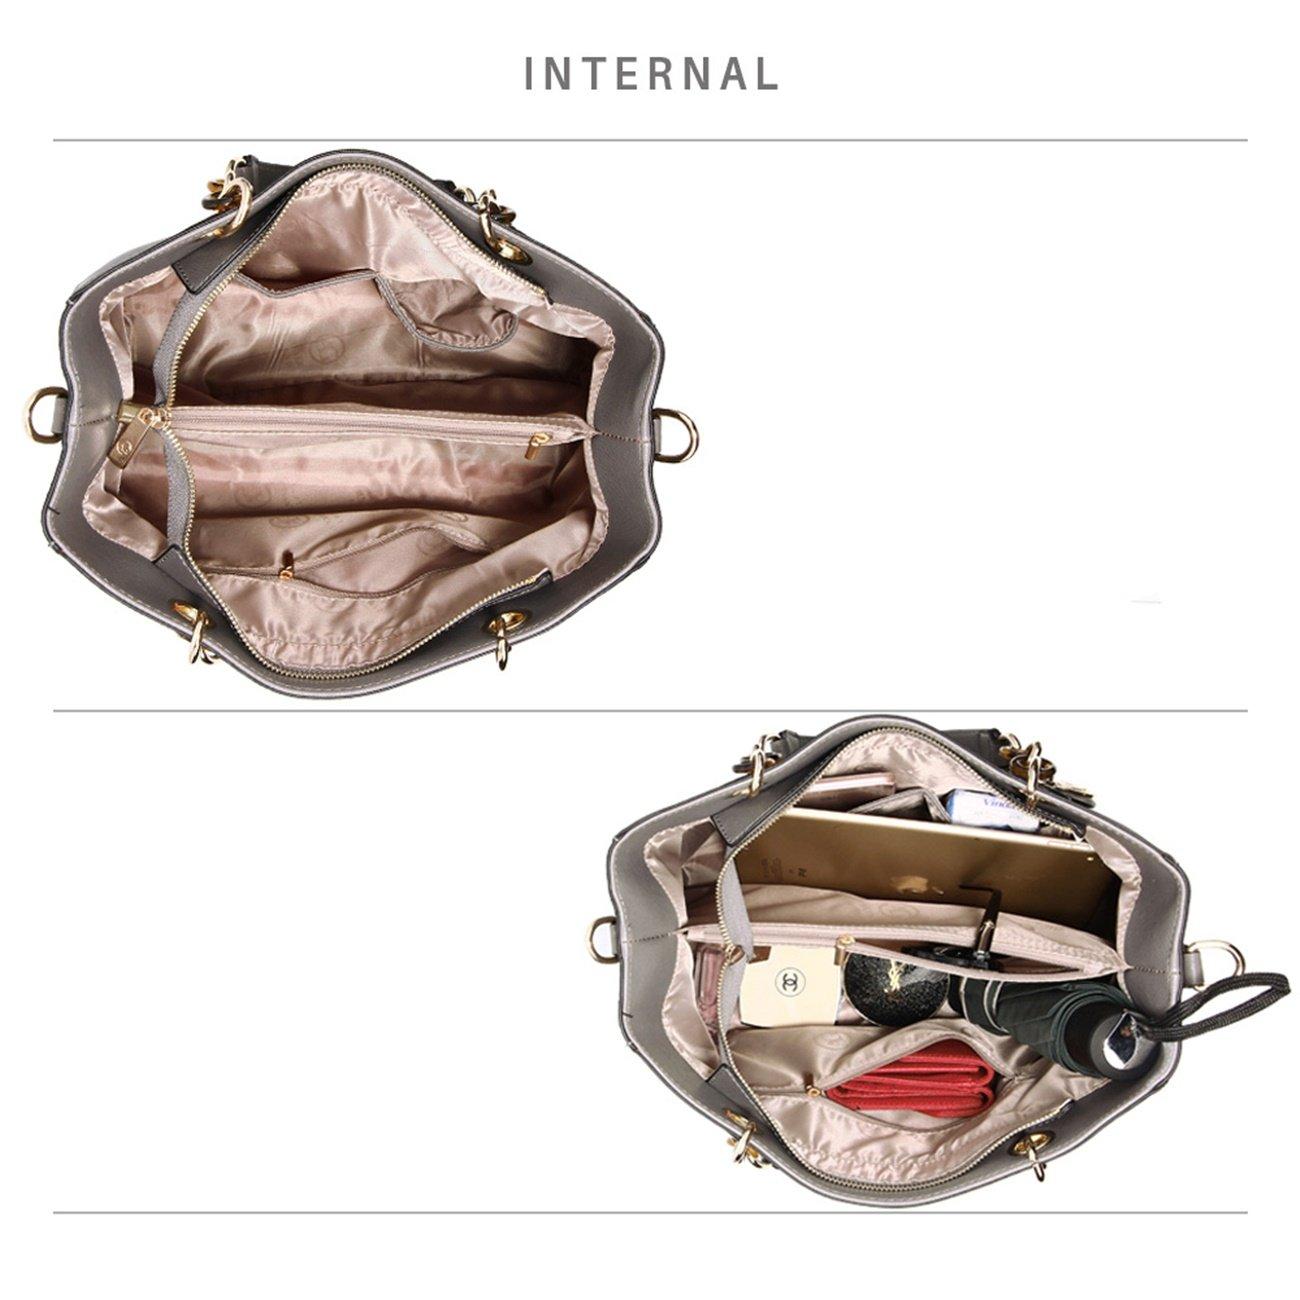 4cde80ae7af LeahWard Womens Designer Tote Bags Large Faux Leather Handbags Shoulder Bag  For Her School 536